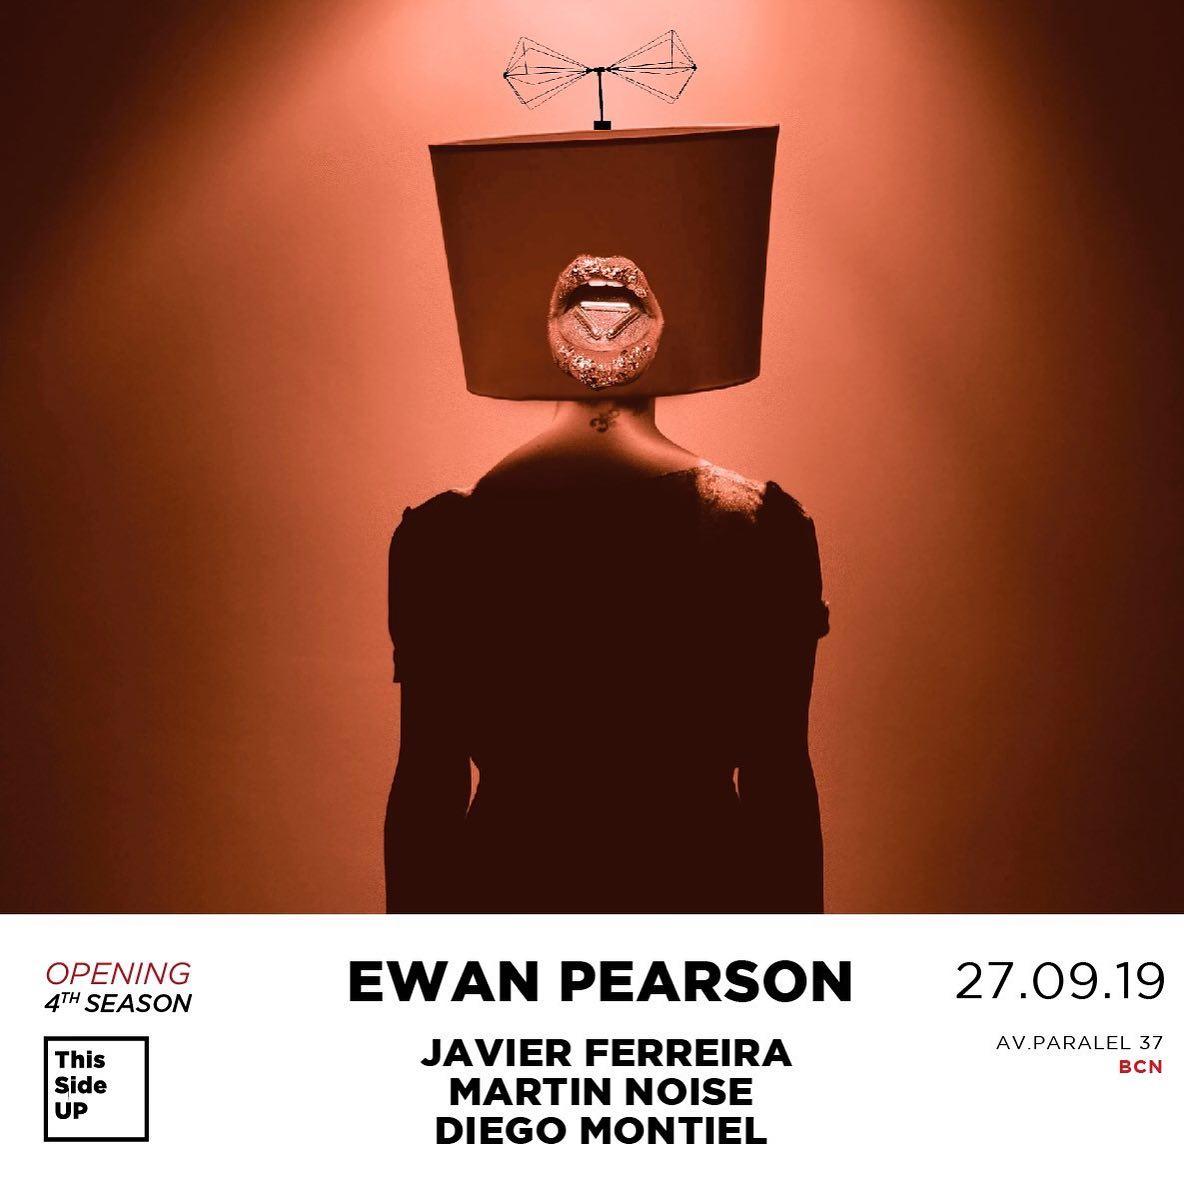 This Side UP - 4th Season Opening - w/ Ewan Pearson